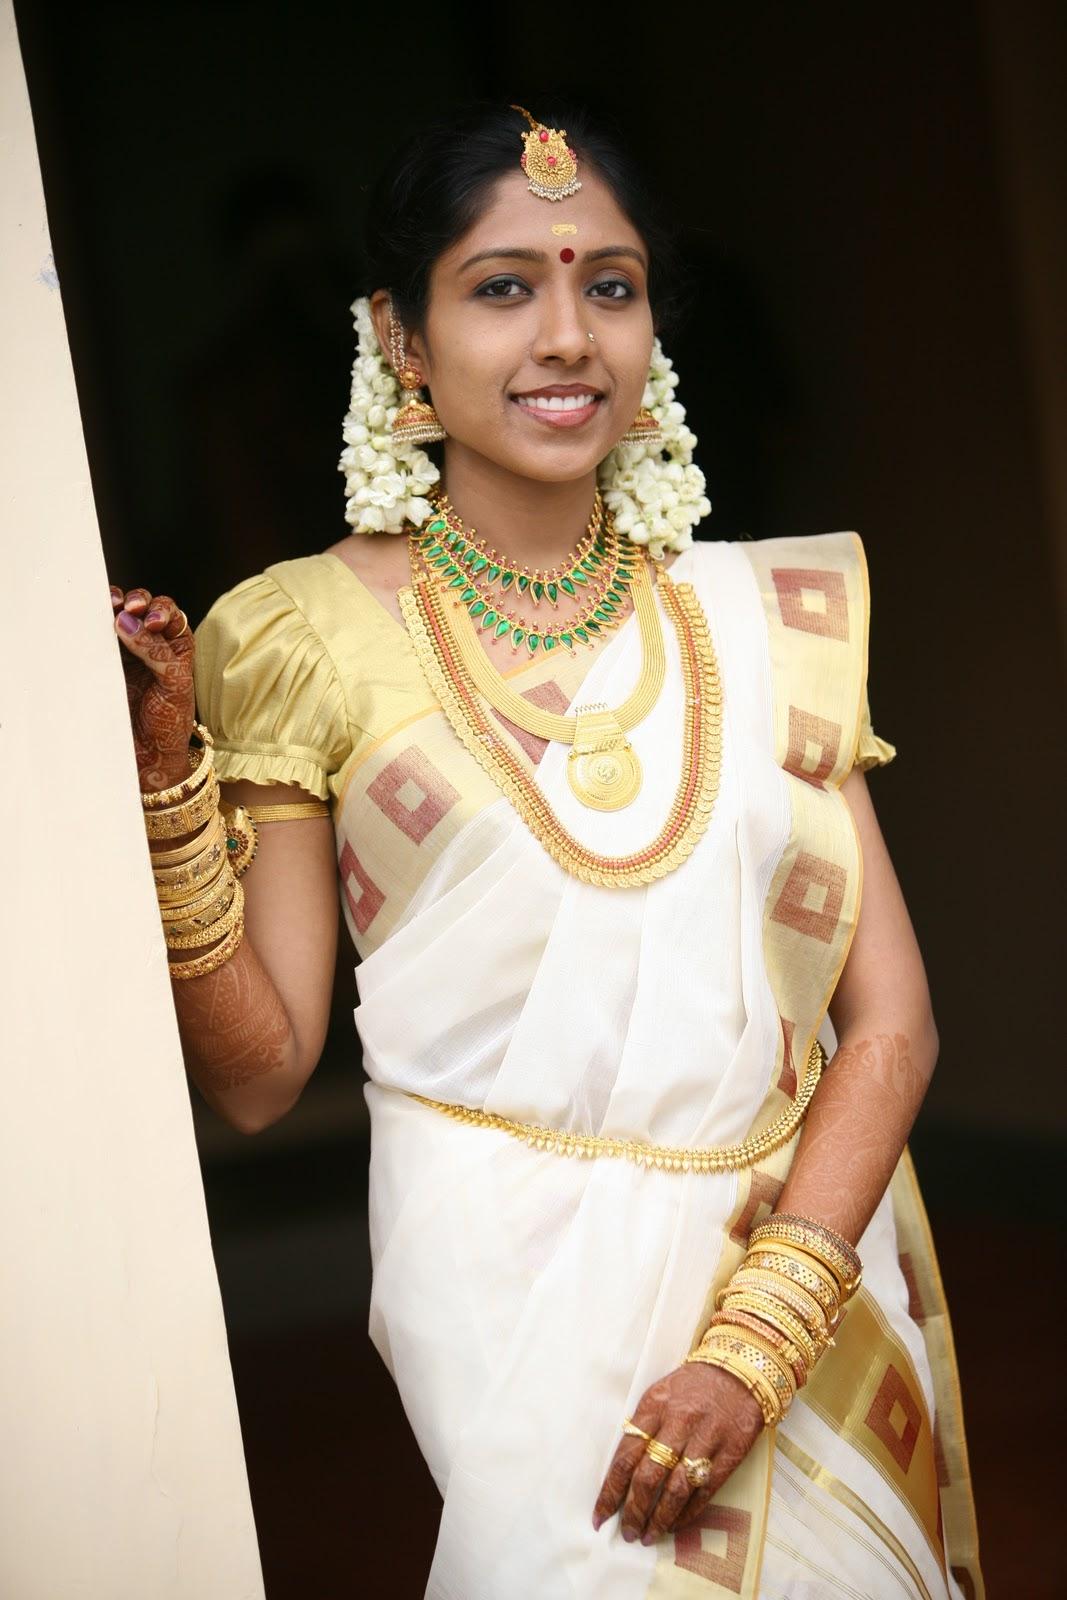 Kerala girls photos gallery sex porn images for Bathroom models in kerala